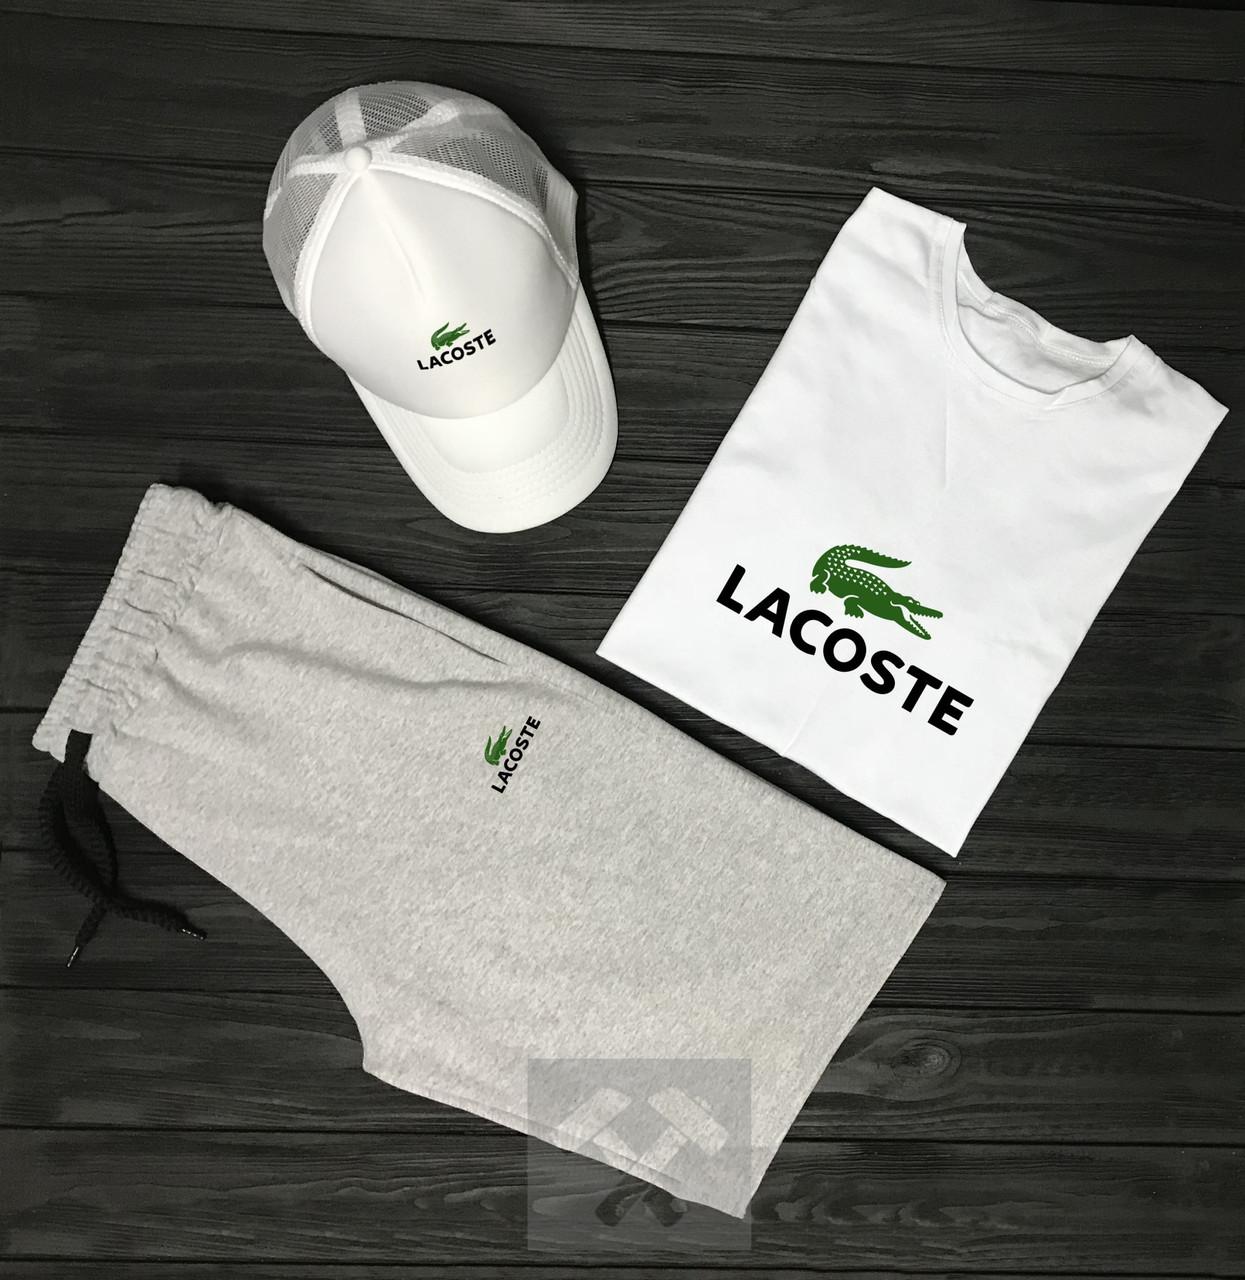 Комплект Lacoste (шорты+футболка+кепка)